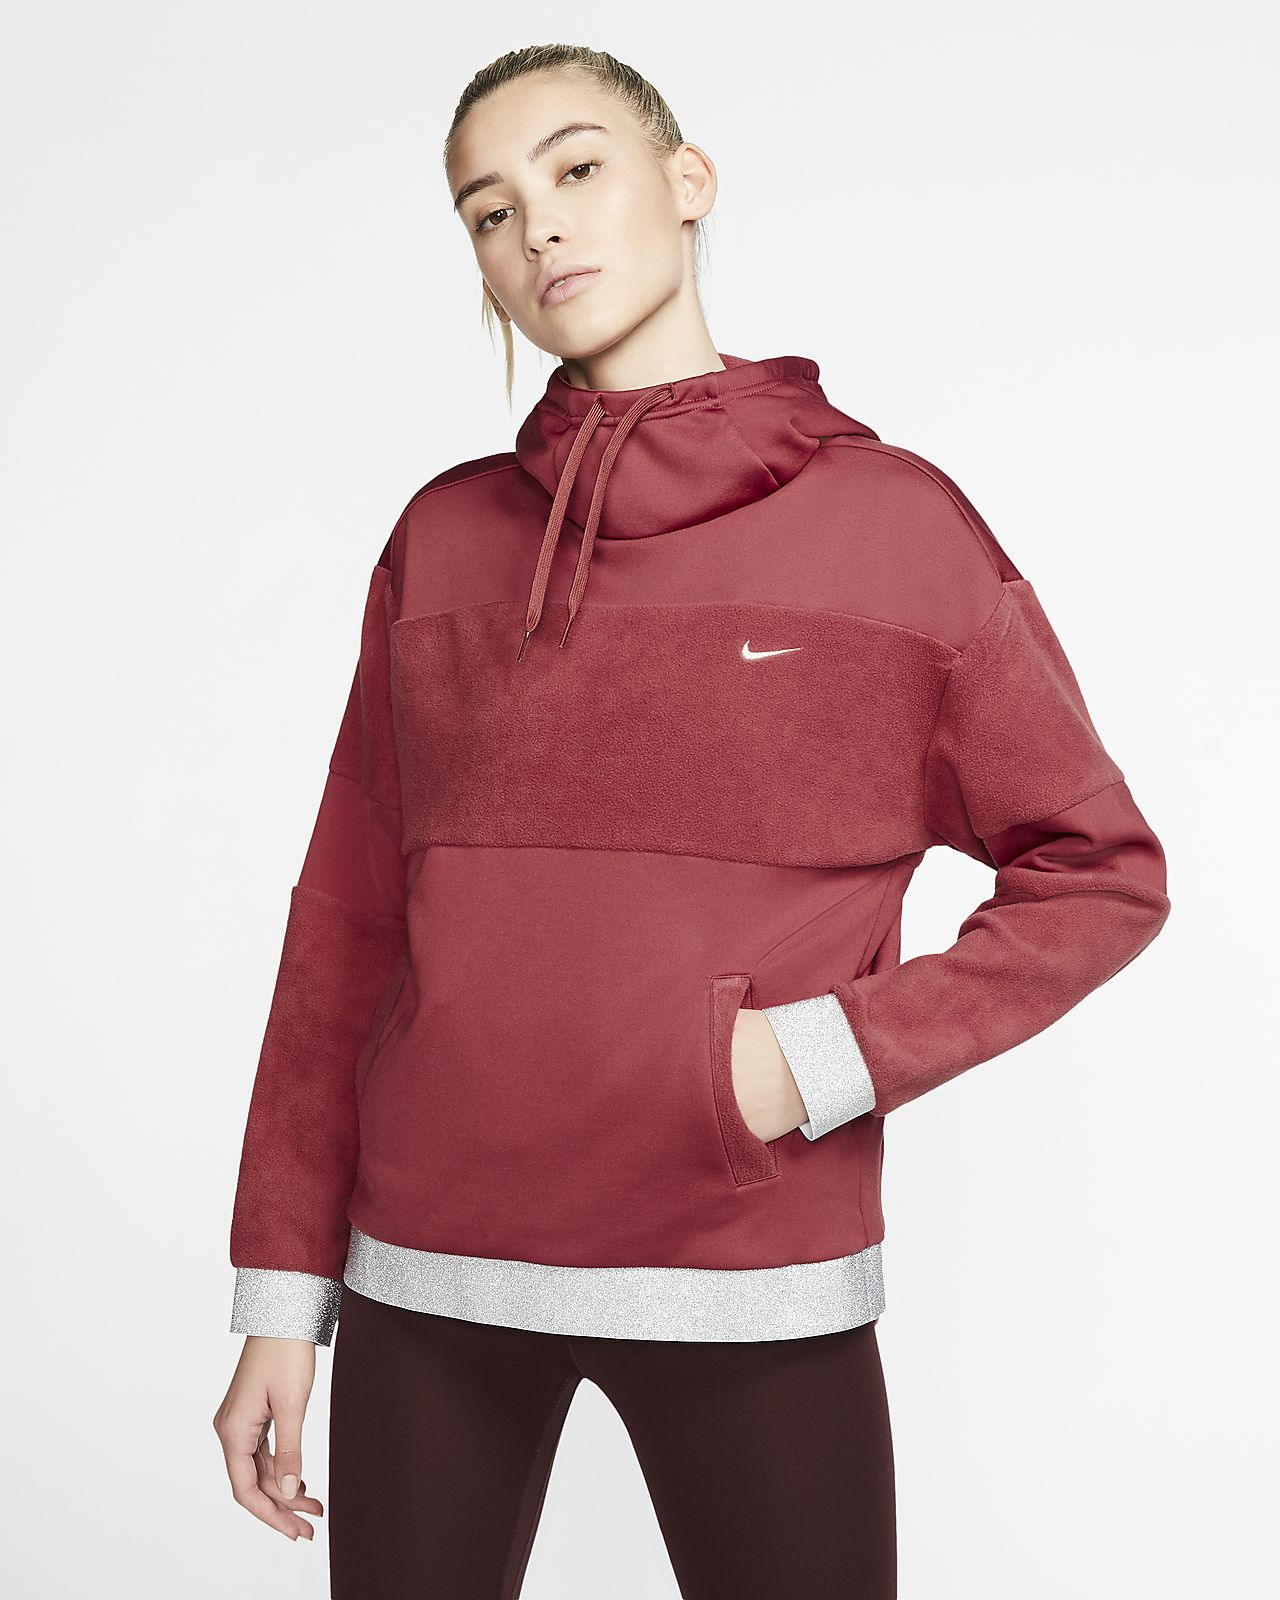 Damska dzianinowa bluza treningowa z kapturem Nike Icon Clash